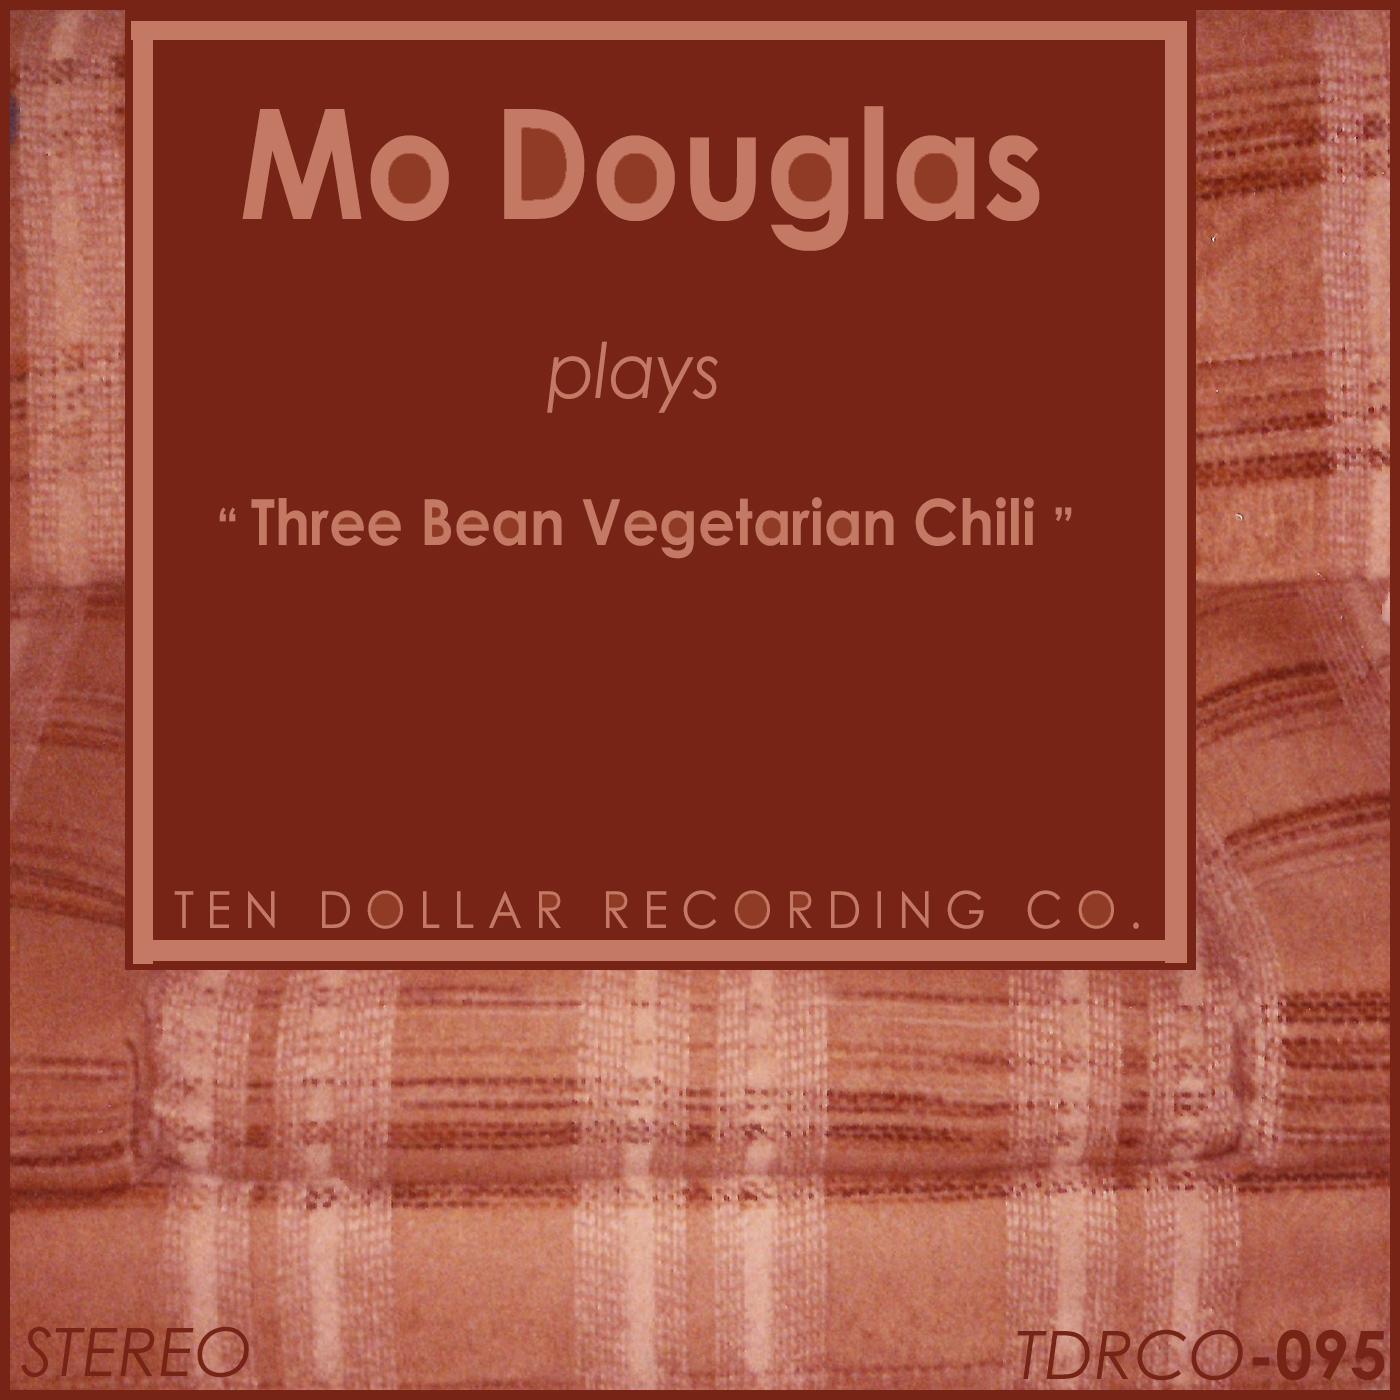 Mo Douglas - Three Bean Vegetarian Chili (Single)